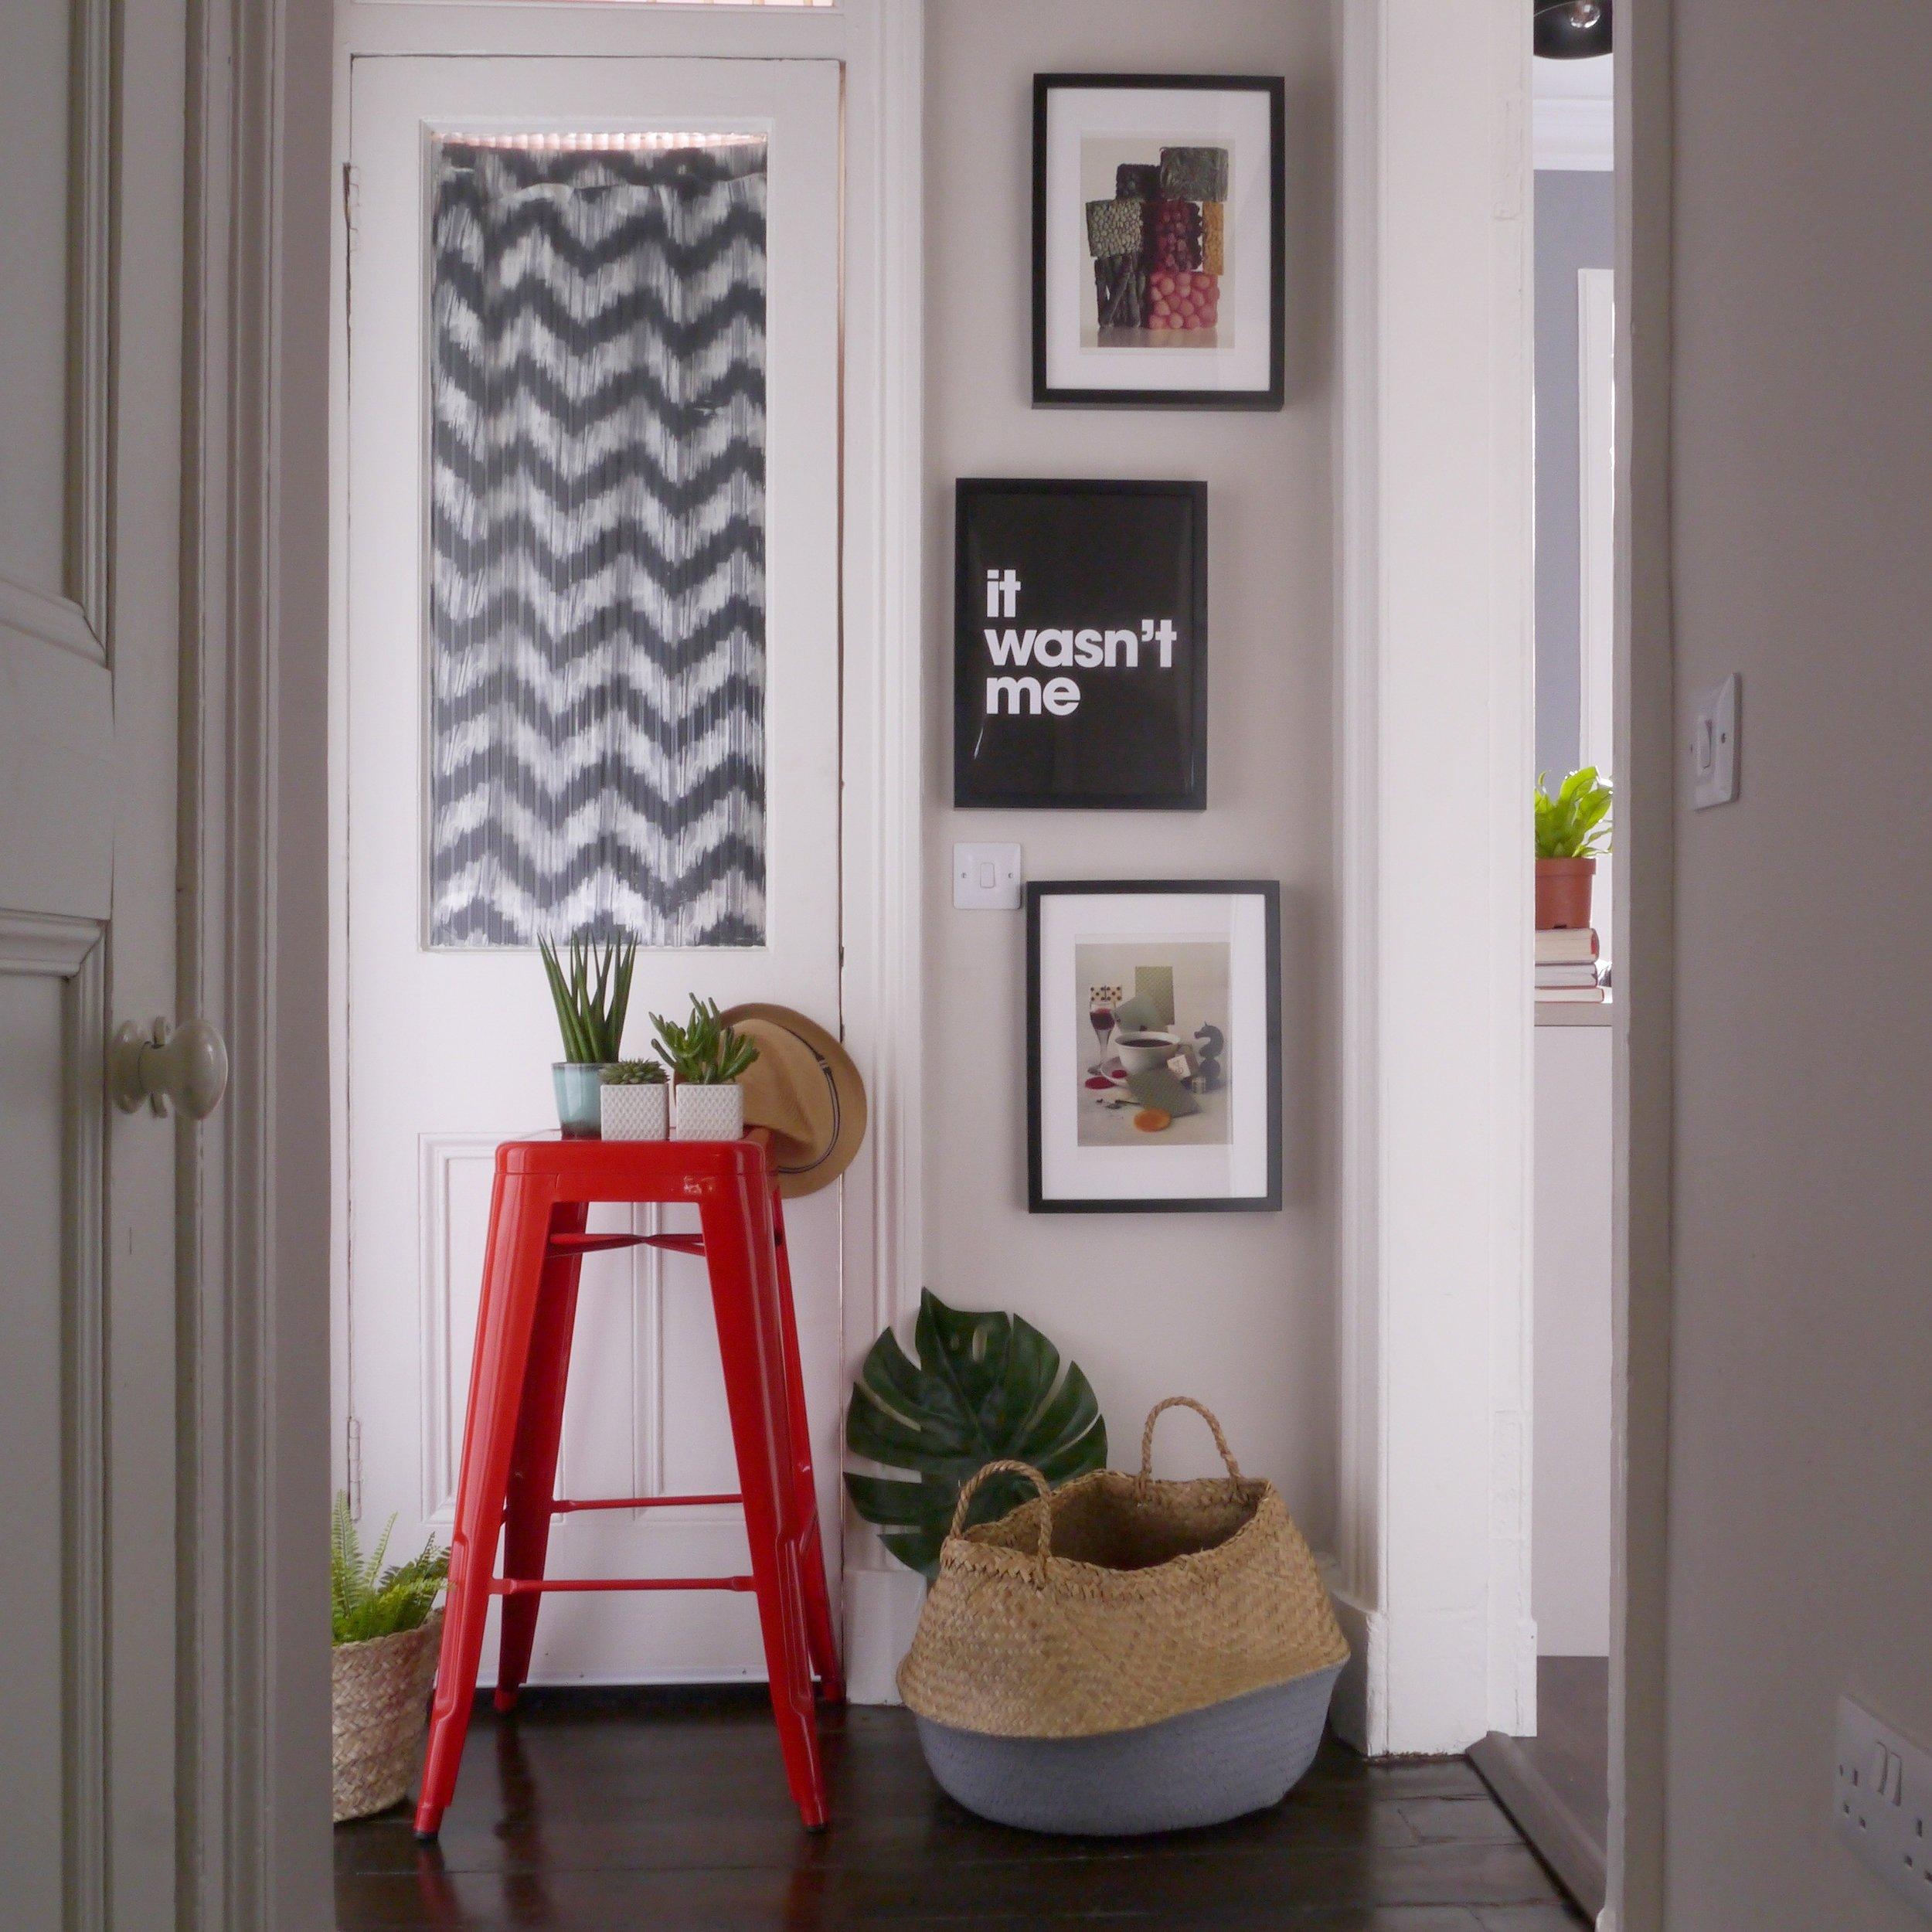 Liznylon_hallway_with_plants_and_artprints.jpg